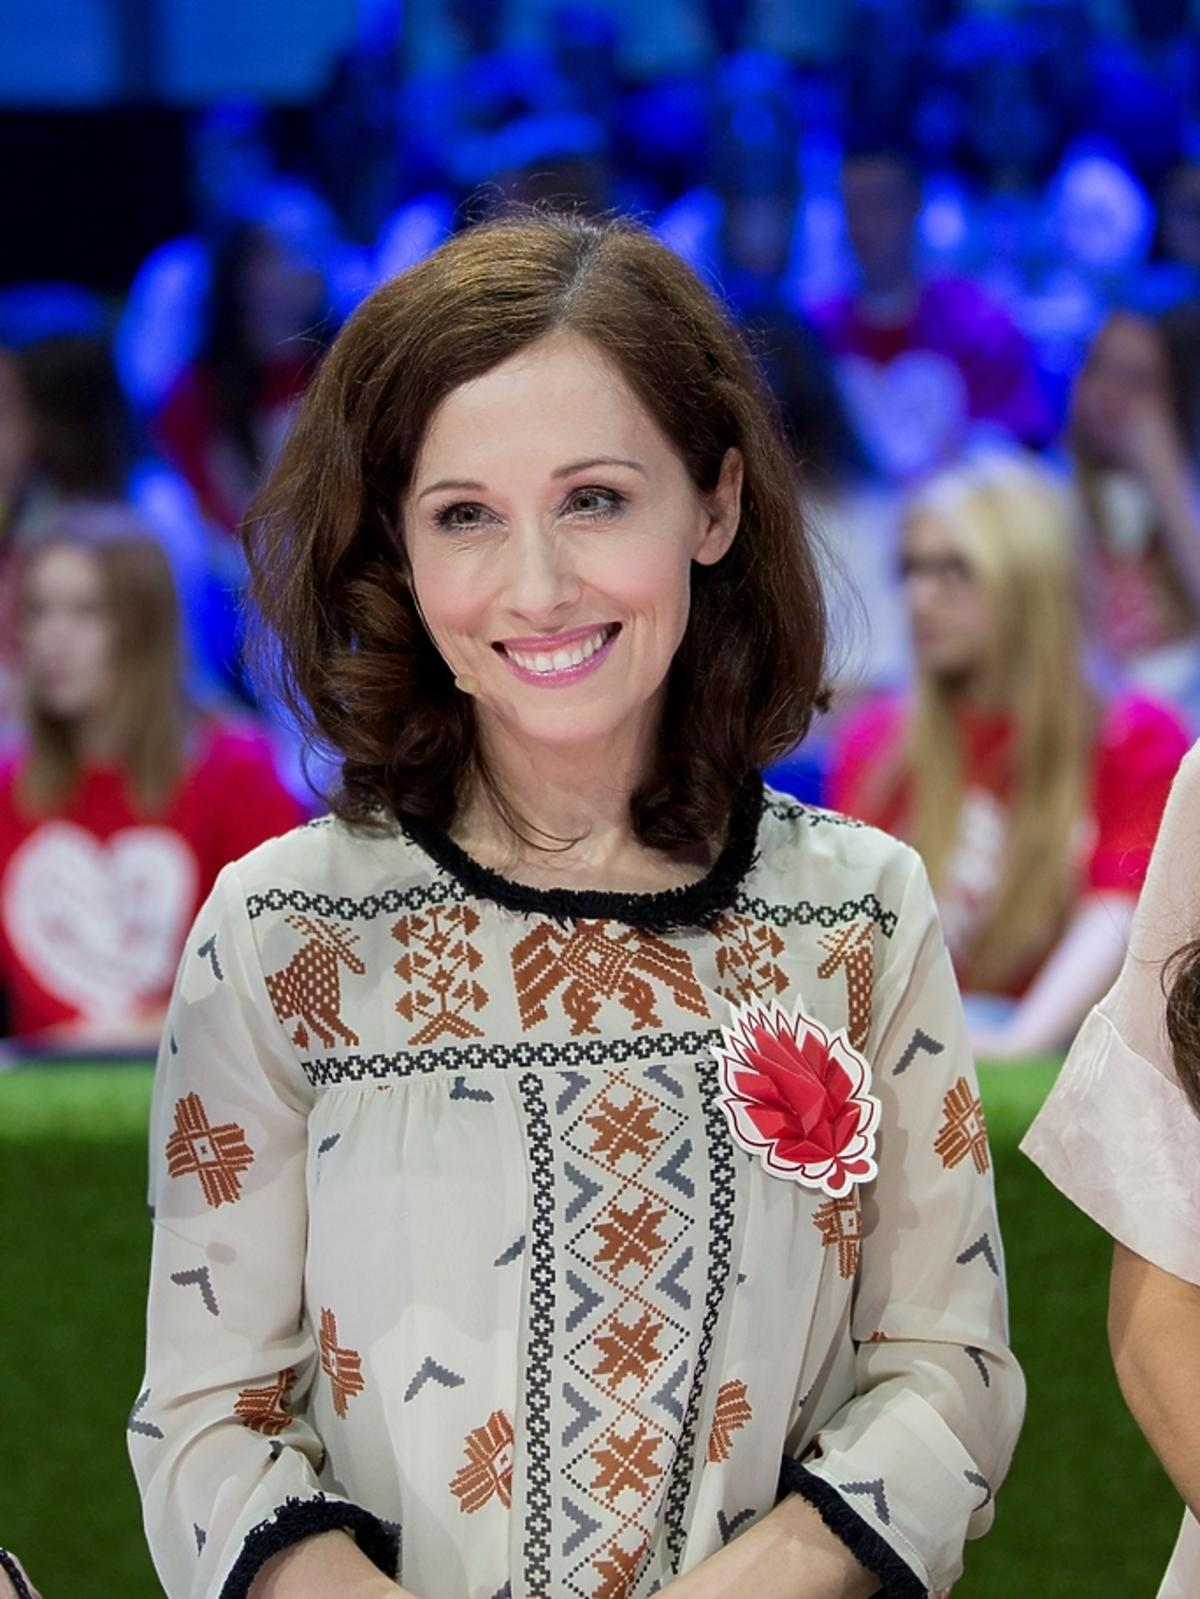 Jolanta Fraszyńska, Kocham Cię Polsko